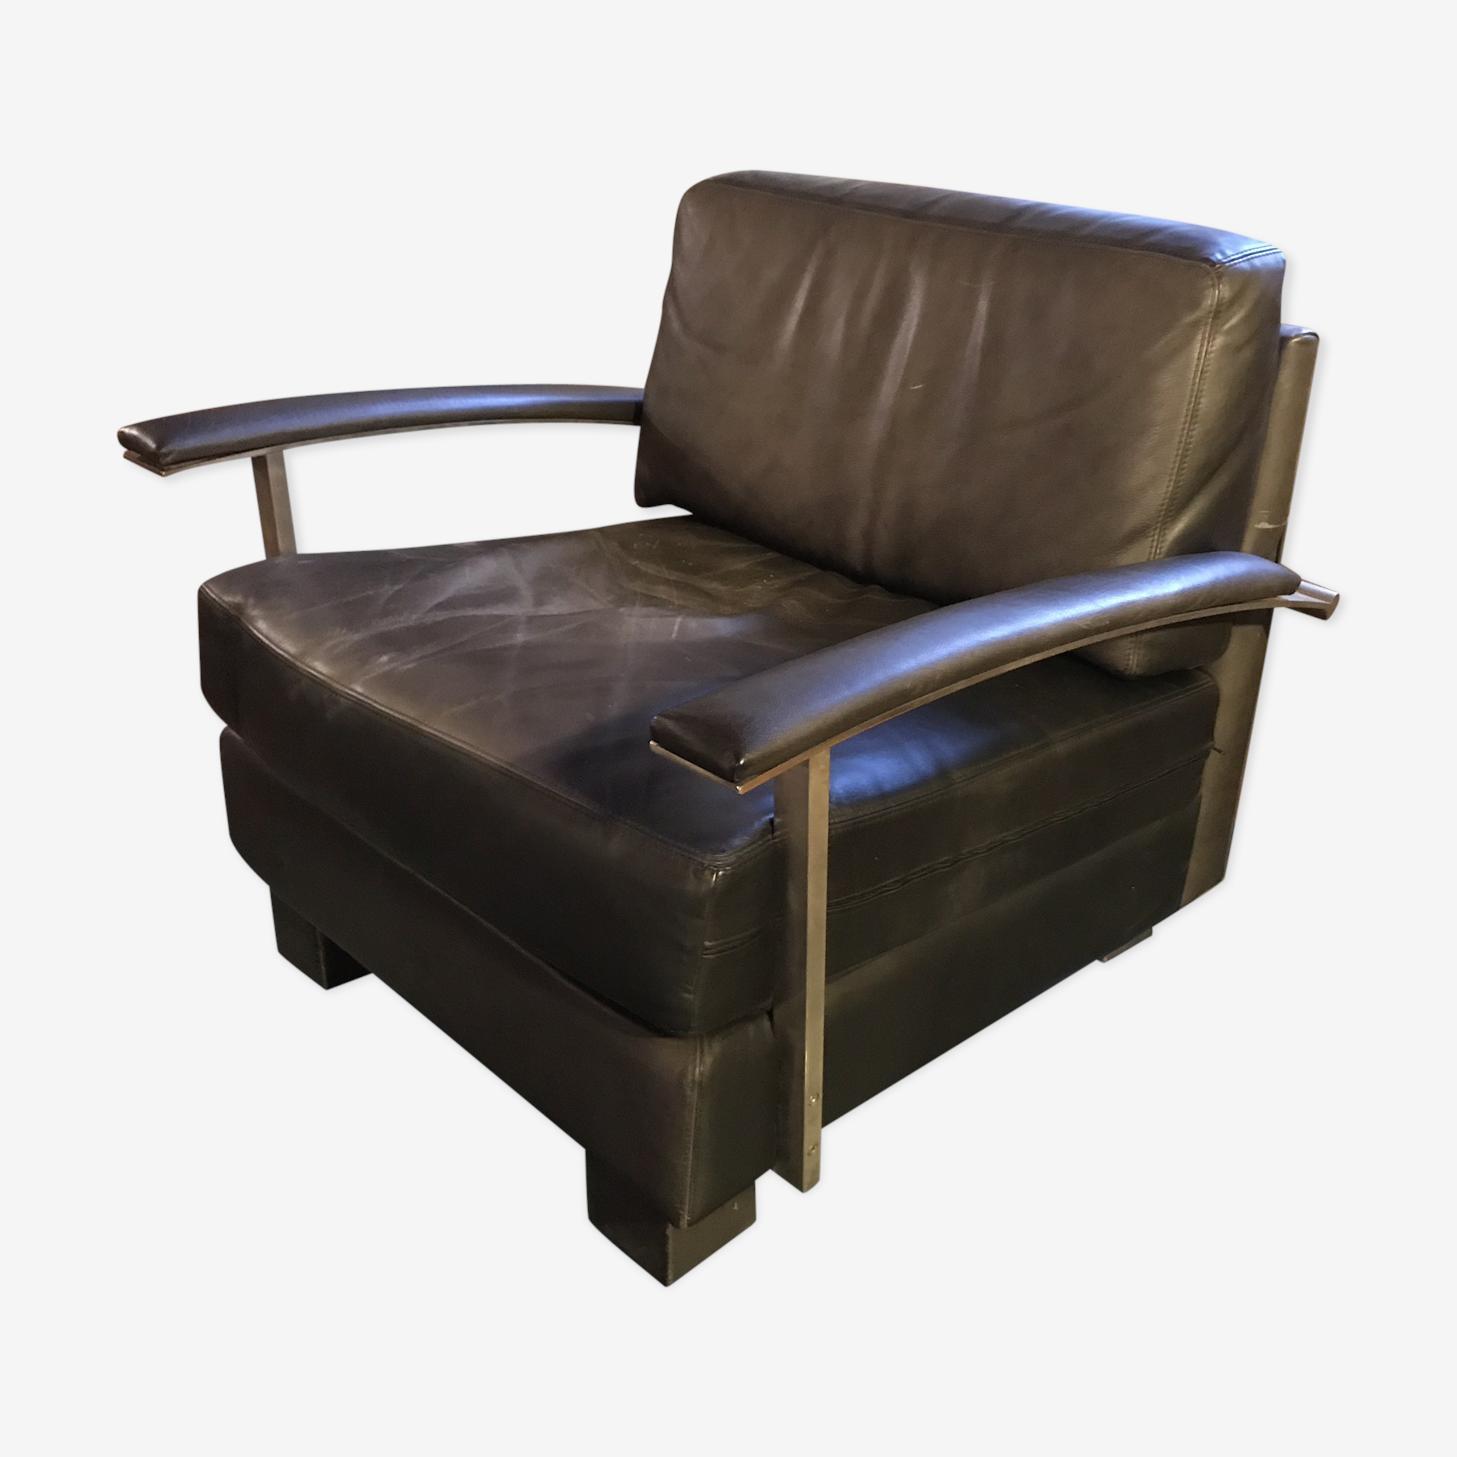 Washington armchair by Jean Michel Wilmotte